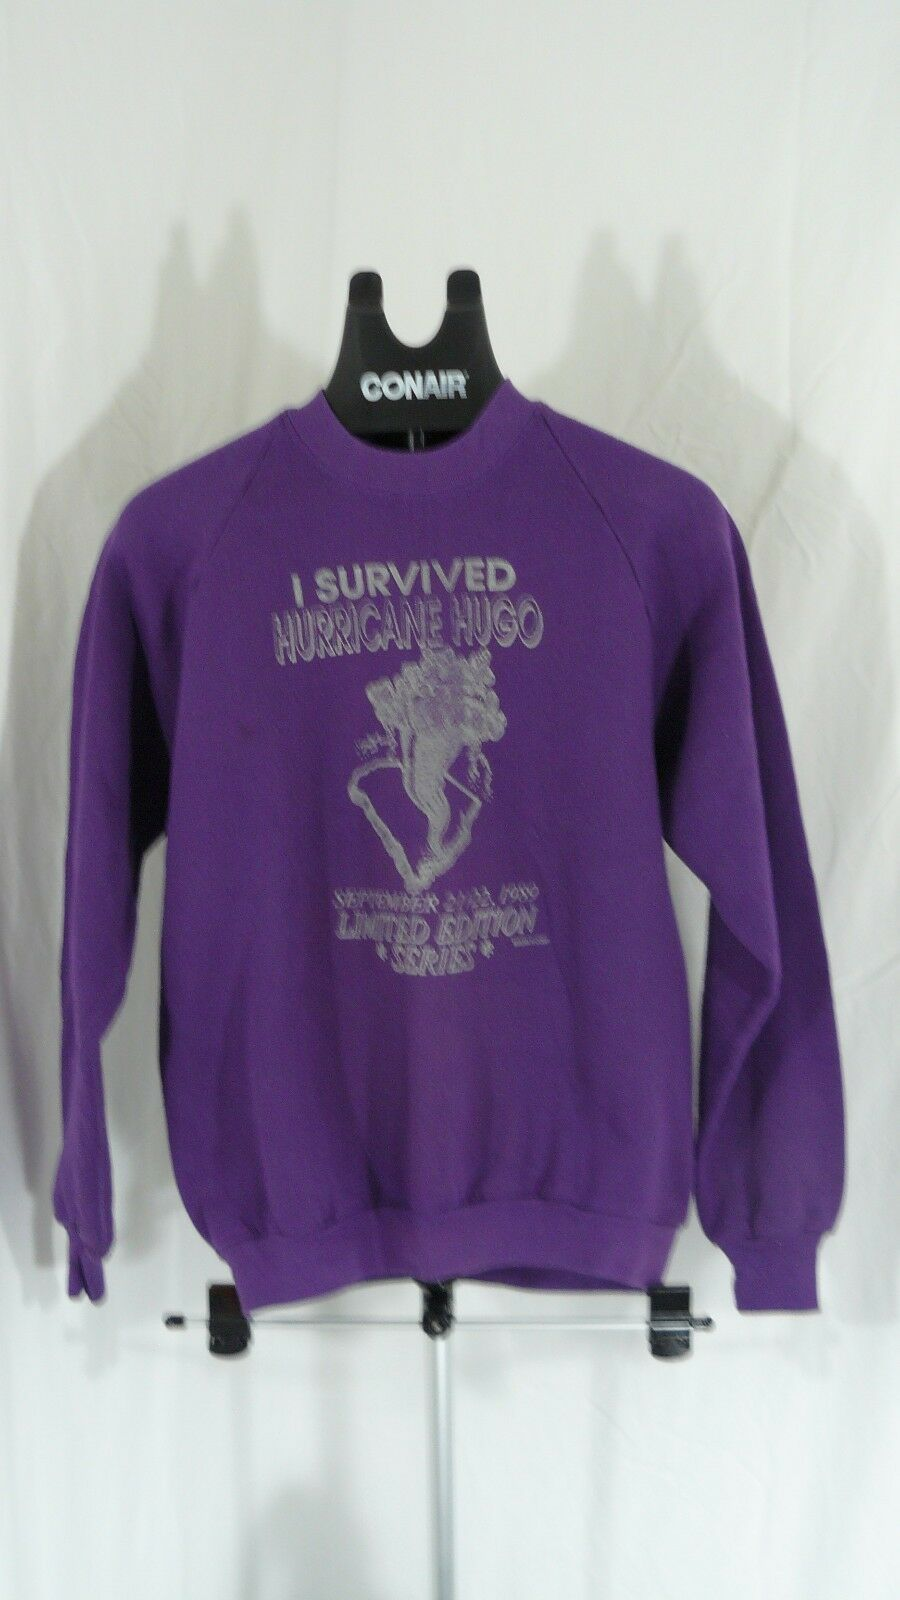 80s vintage 1989 I survive Hurricane Hugo limited edition sweatshirt Jerzees